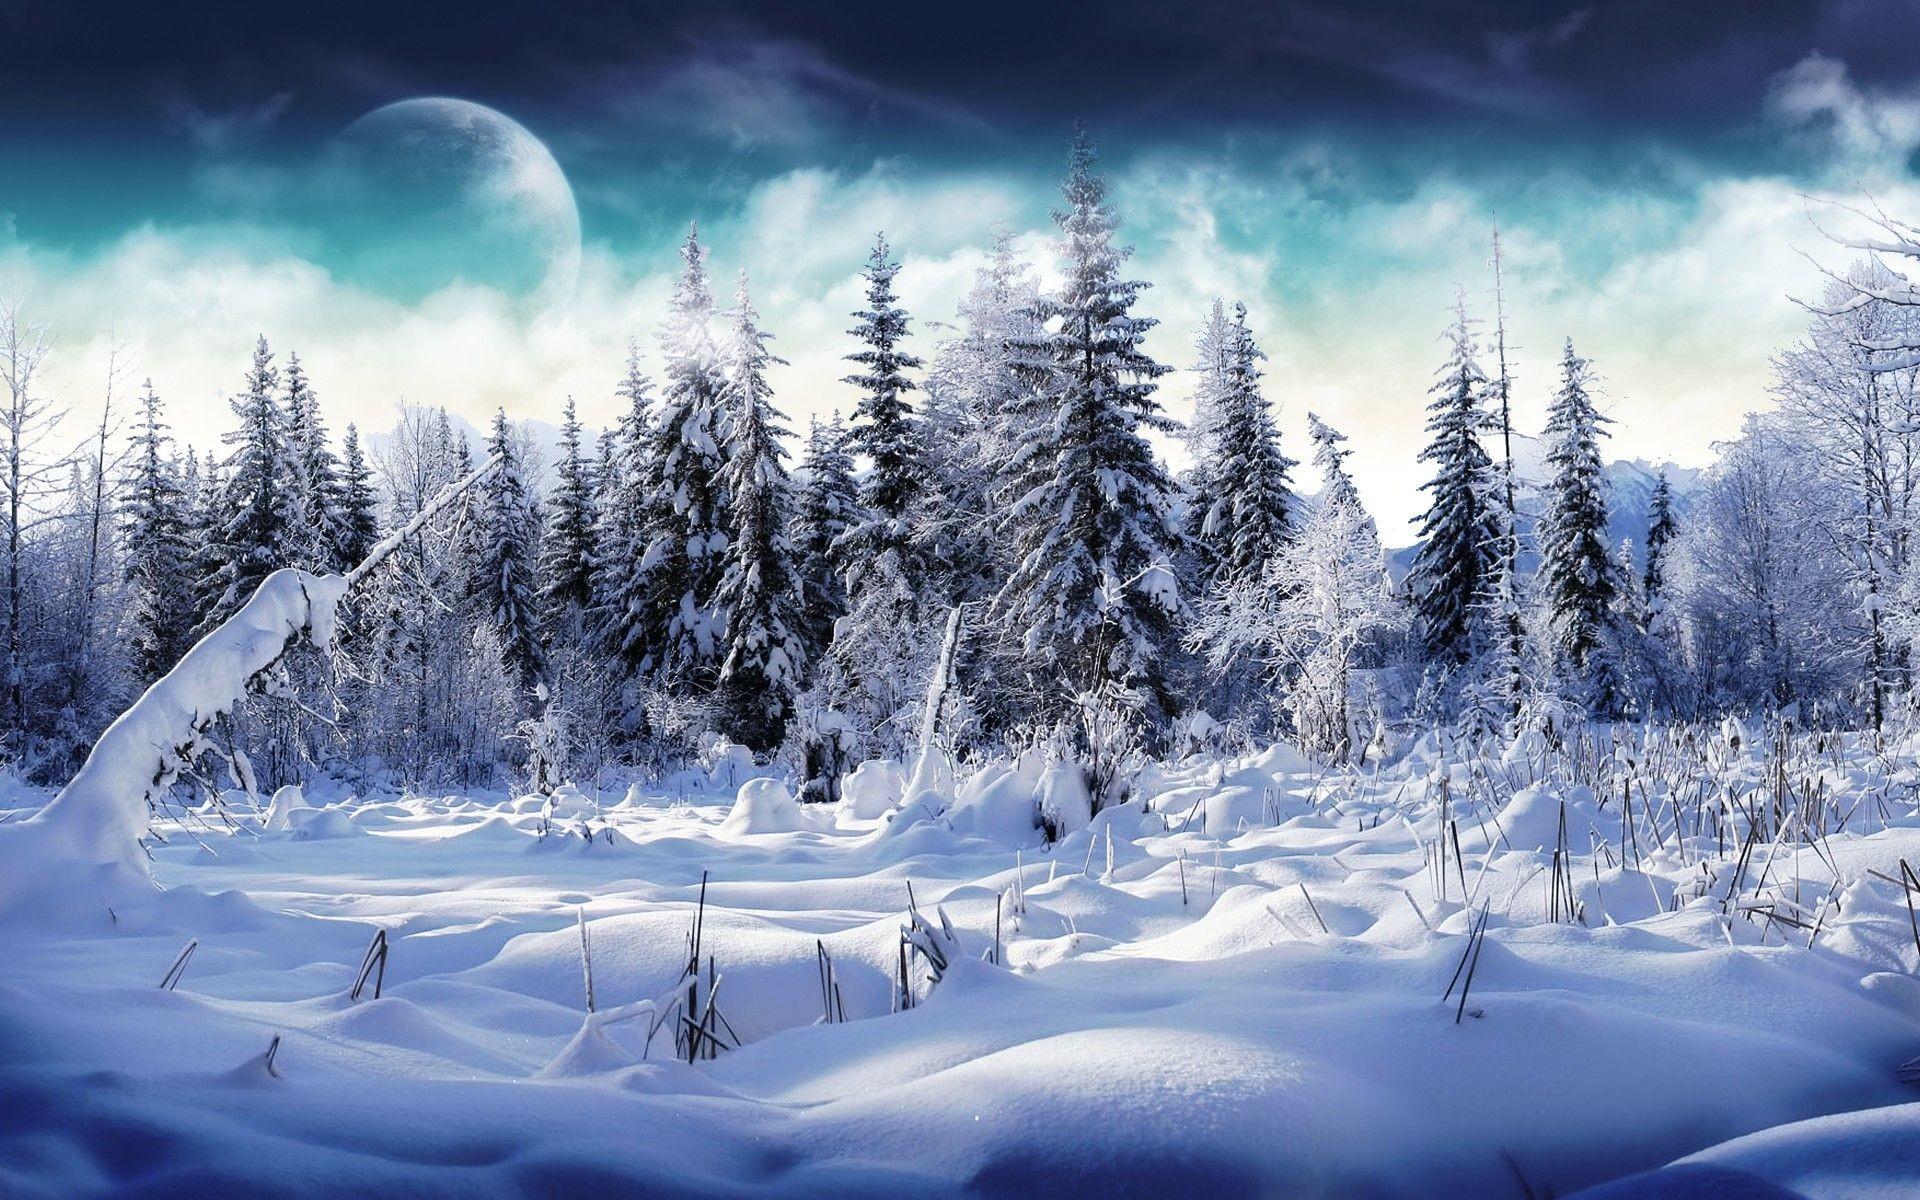 … free winter wallpaper and screensavers 1 …